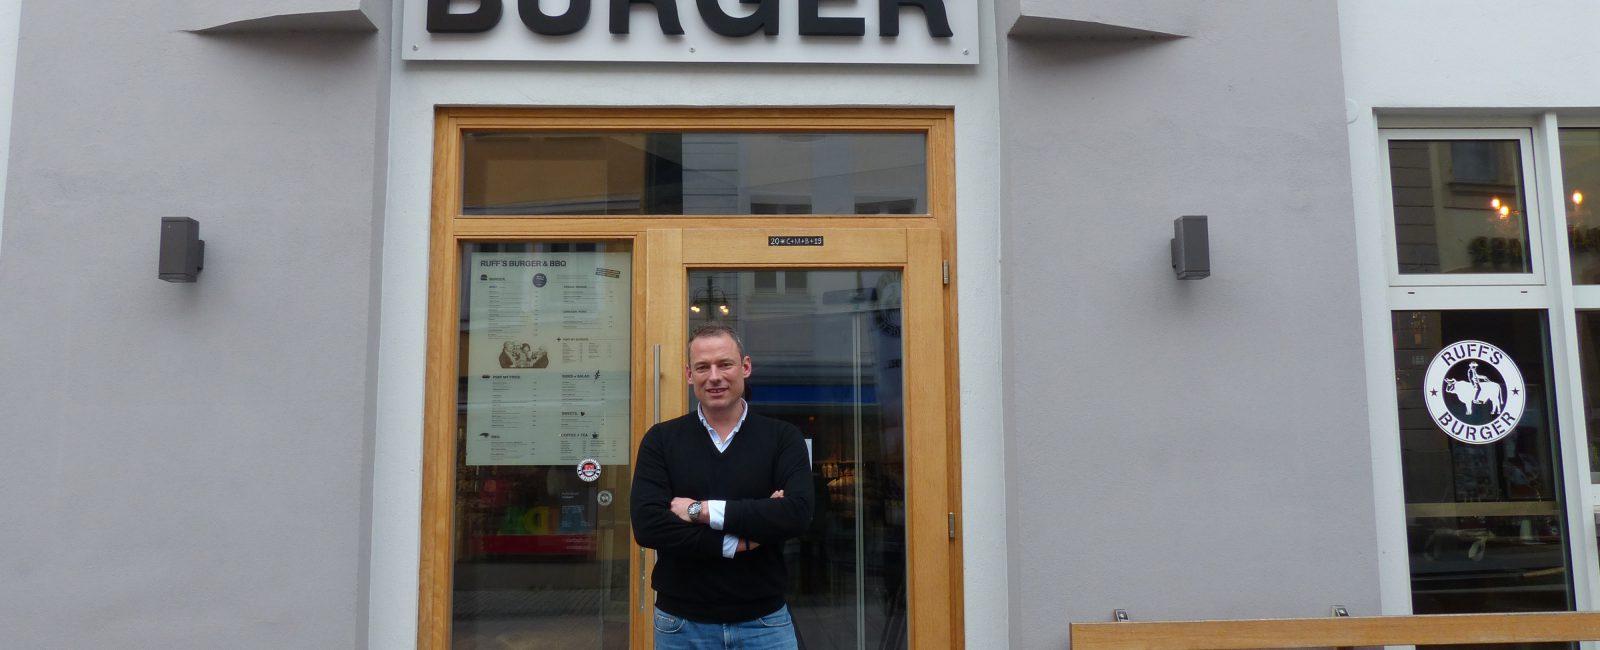 Ruffs Burger Ansbach